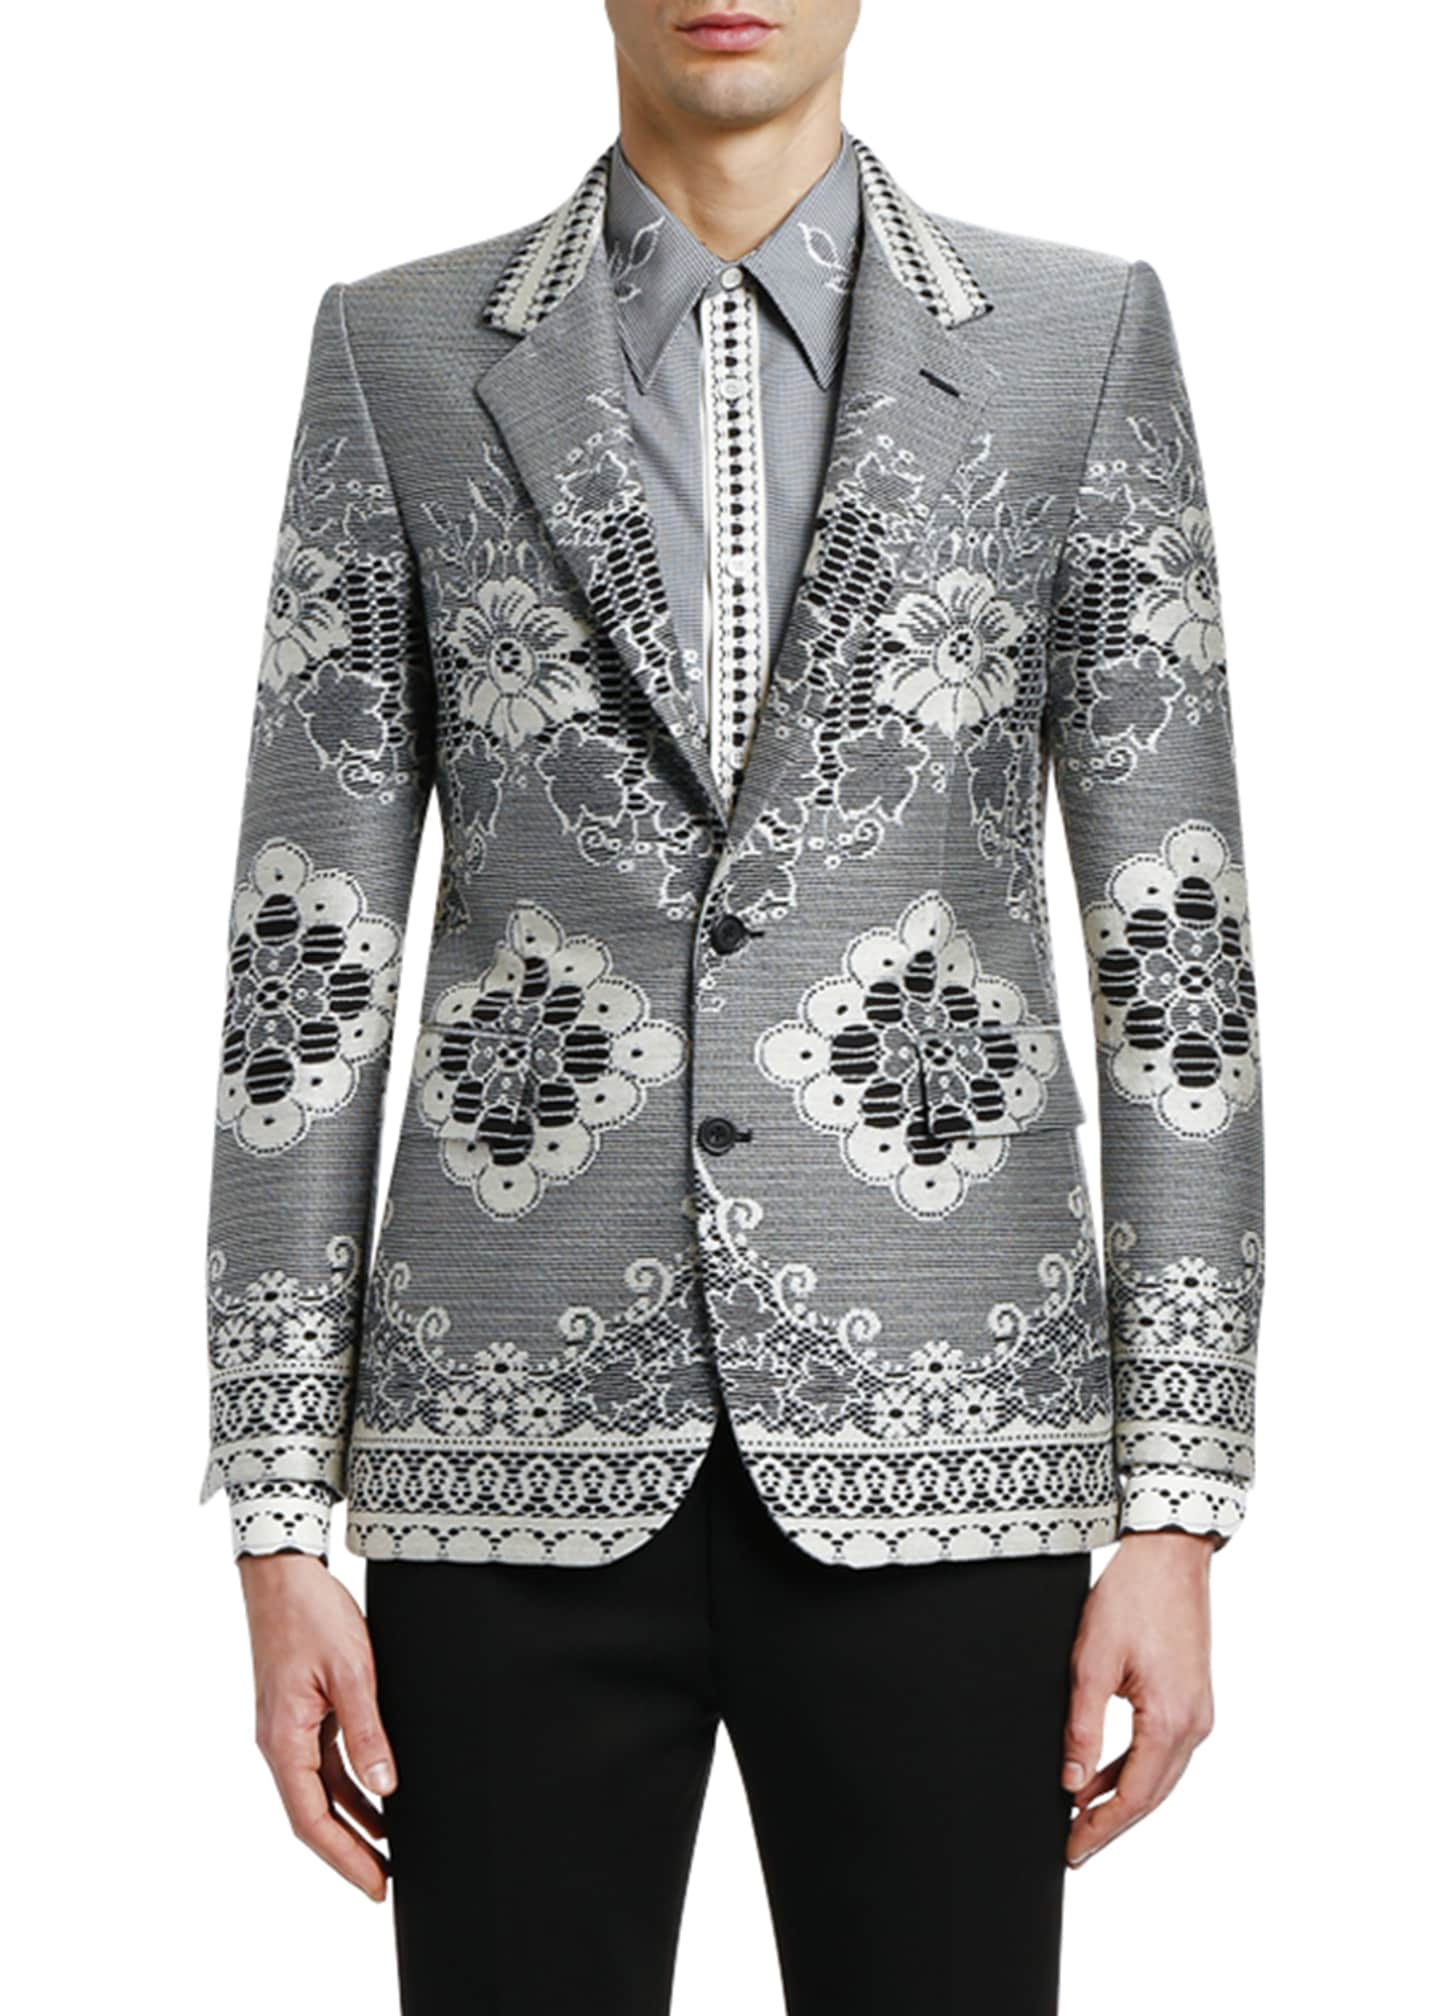 Alexander McQueen Men's Lace Jacquard Two-Button Jacket